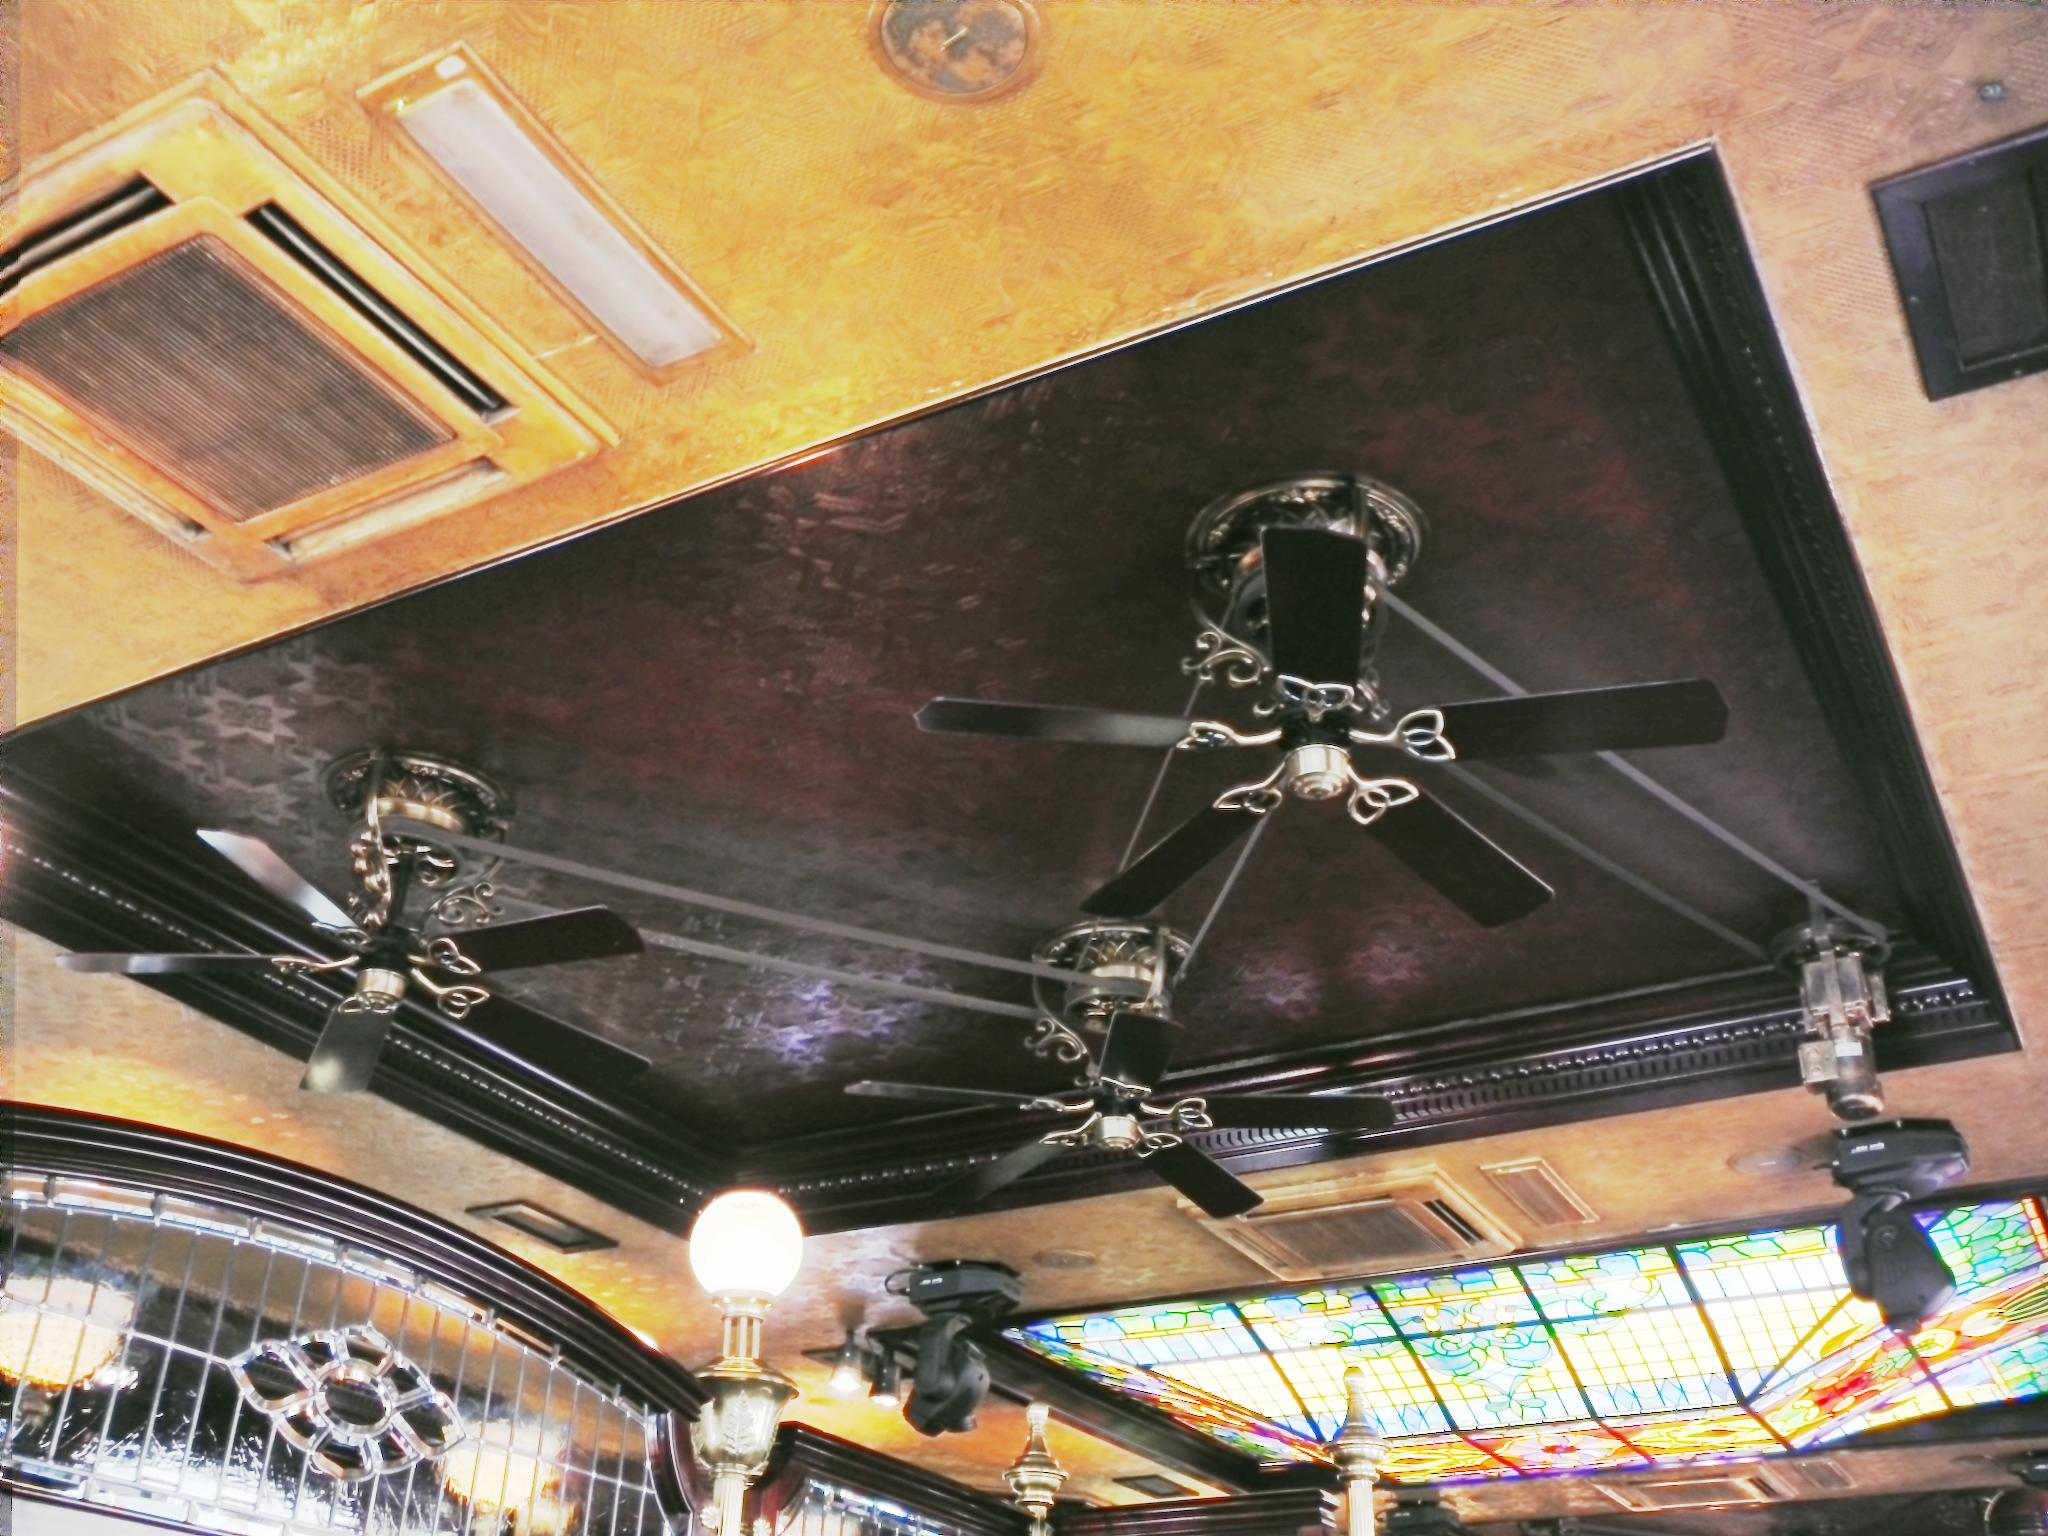 size of the ceiling fan